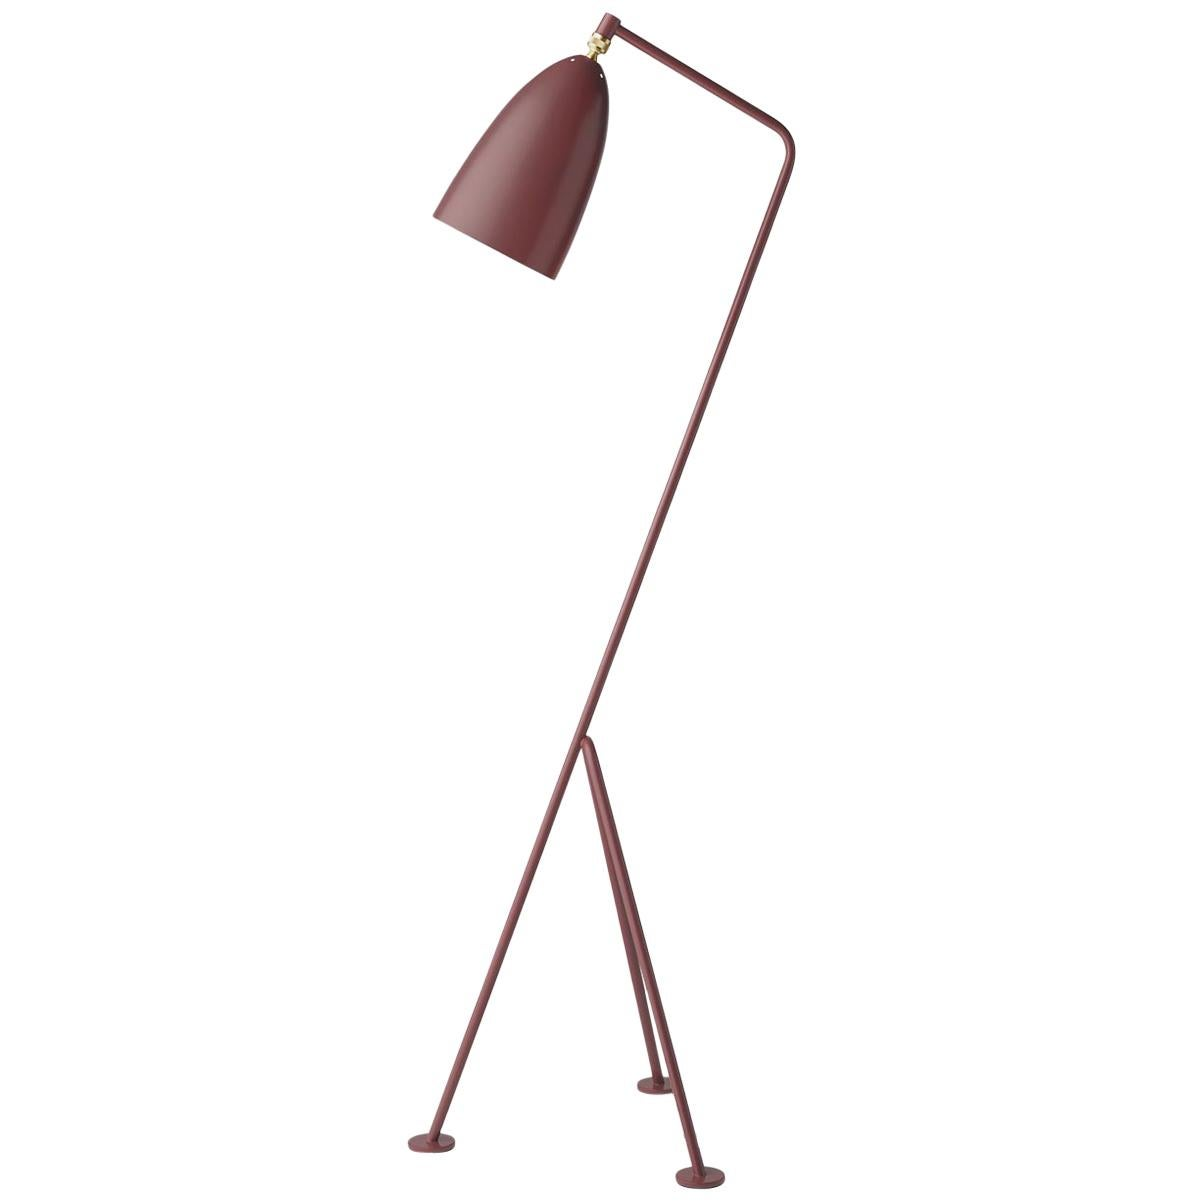 Greta Grossman Grasshopper Floor Lamp, Andorra Red